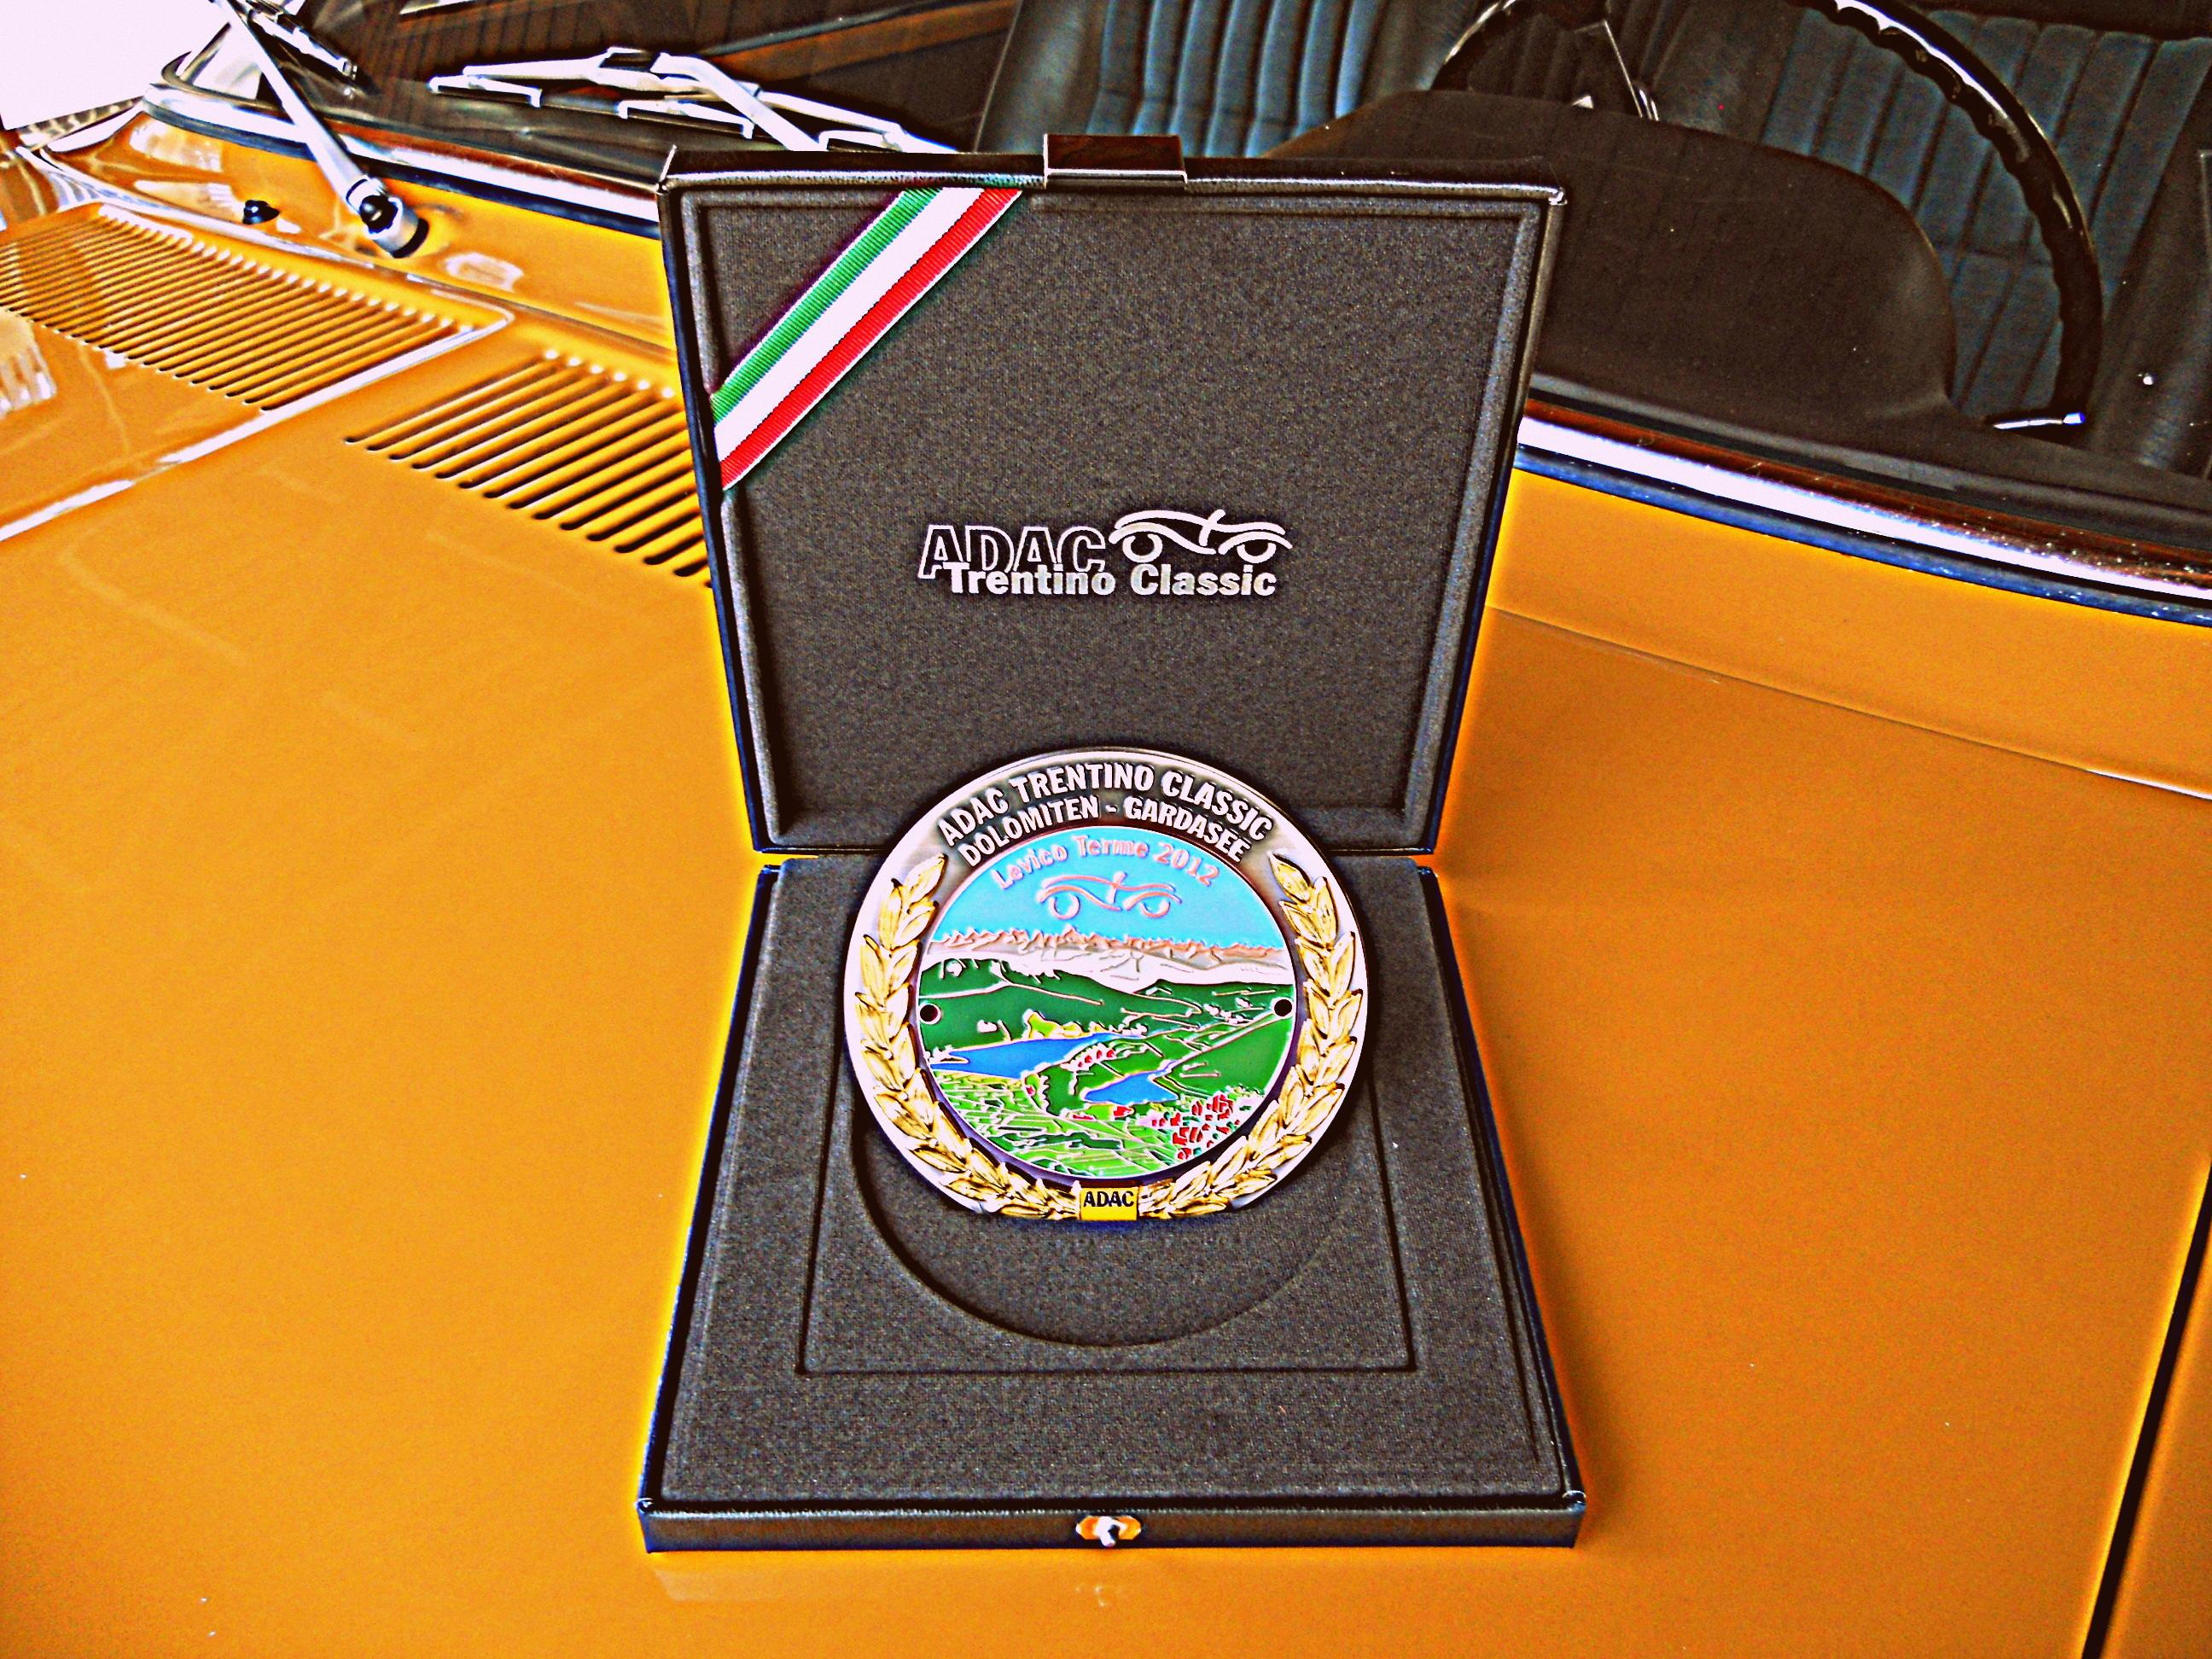 ADAC Trentino Classic Audi 100 Coupe S